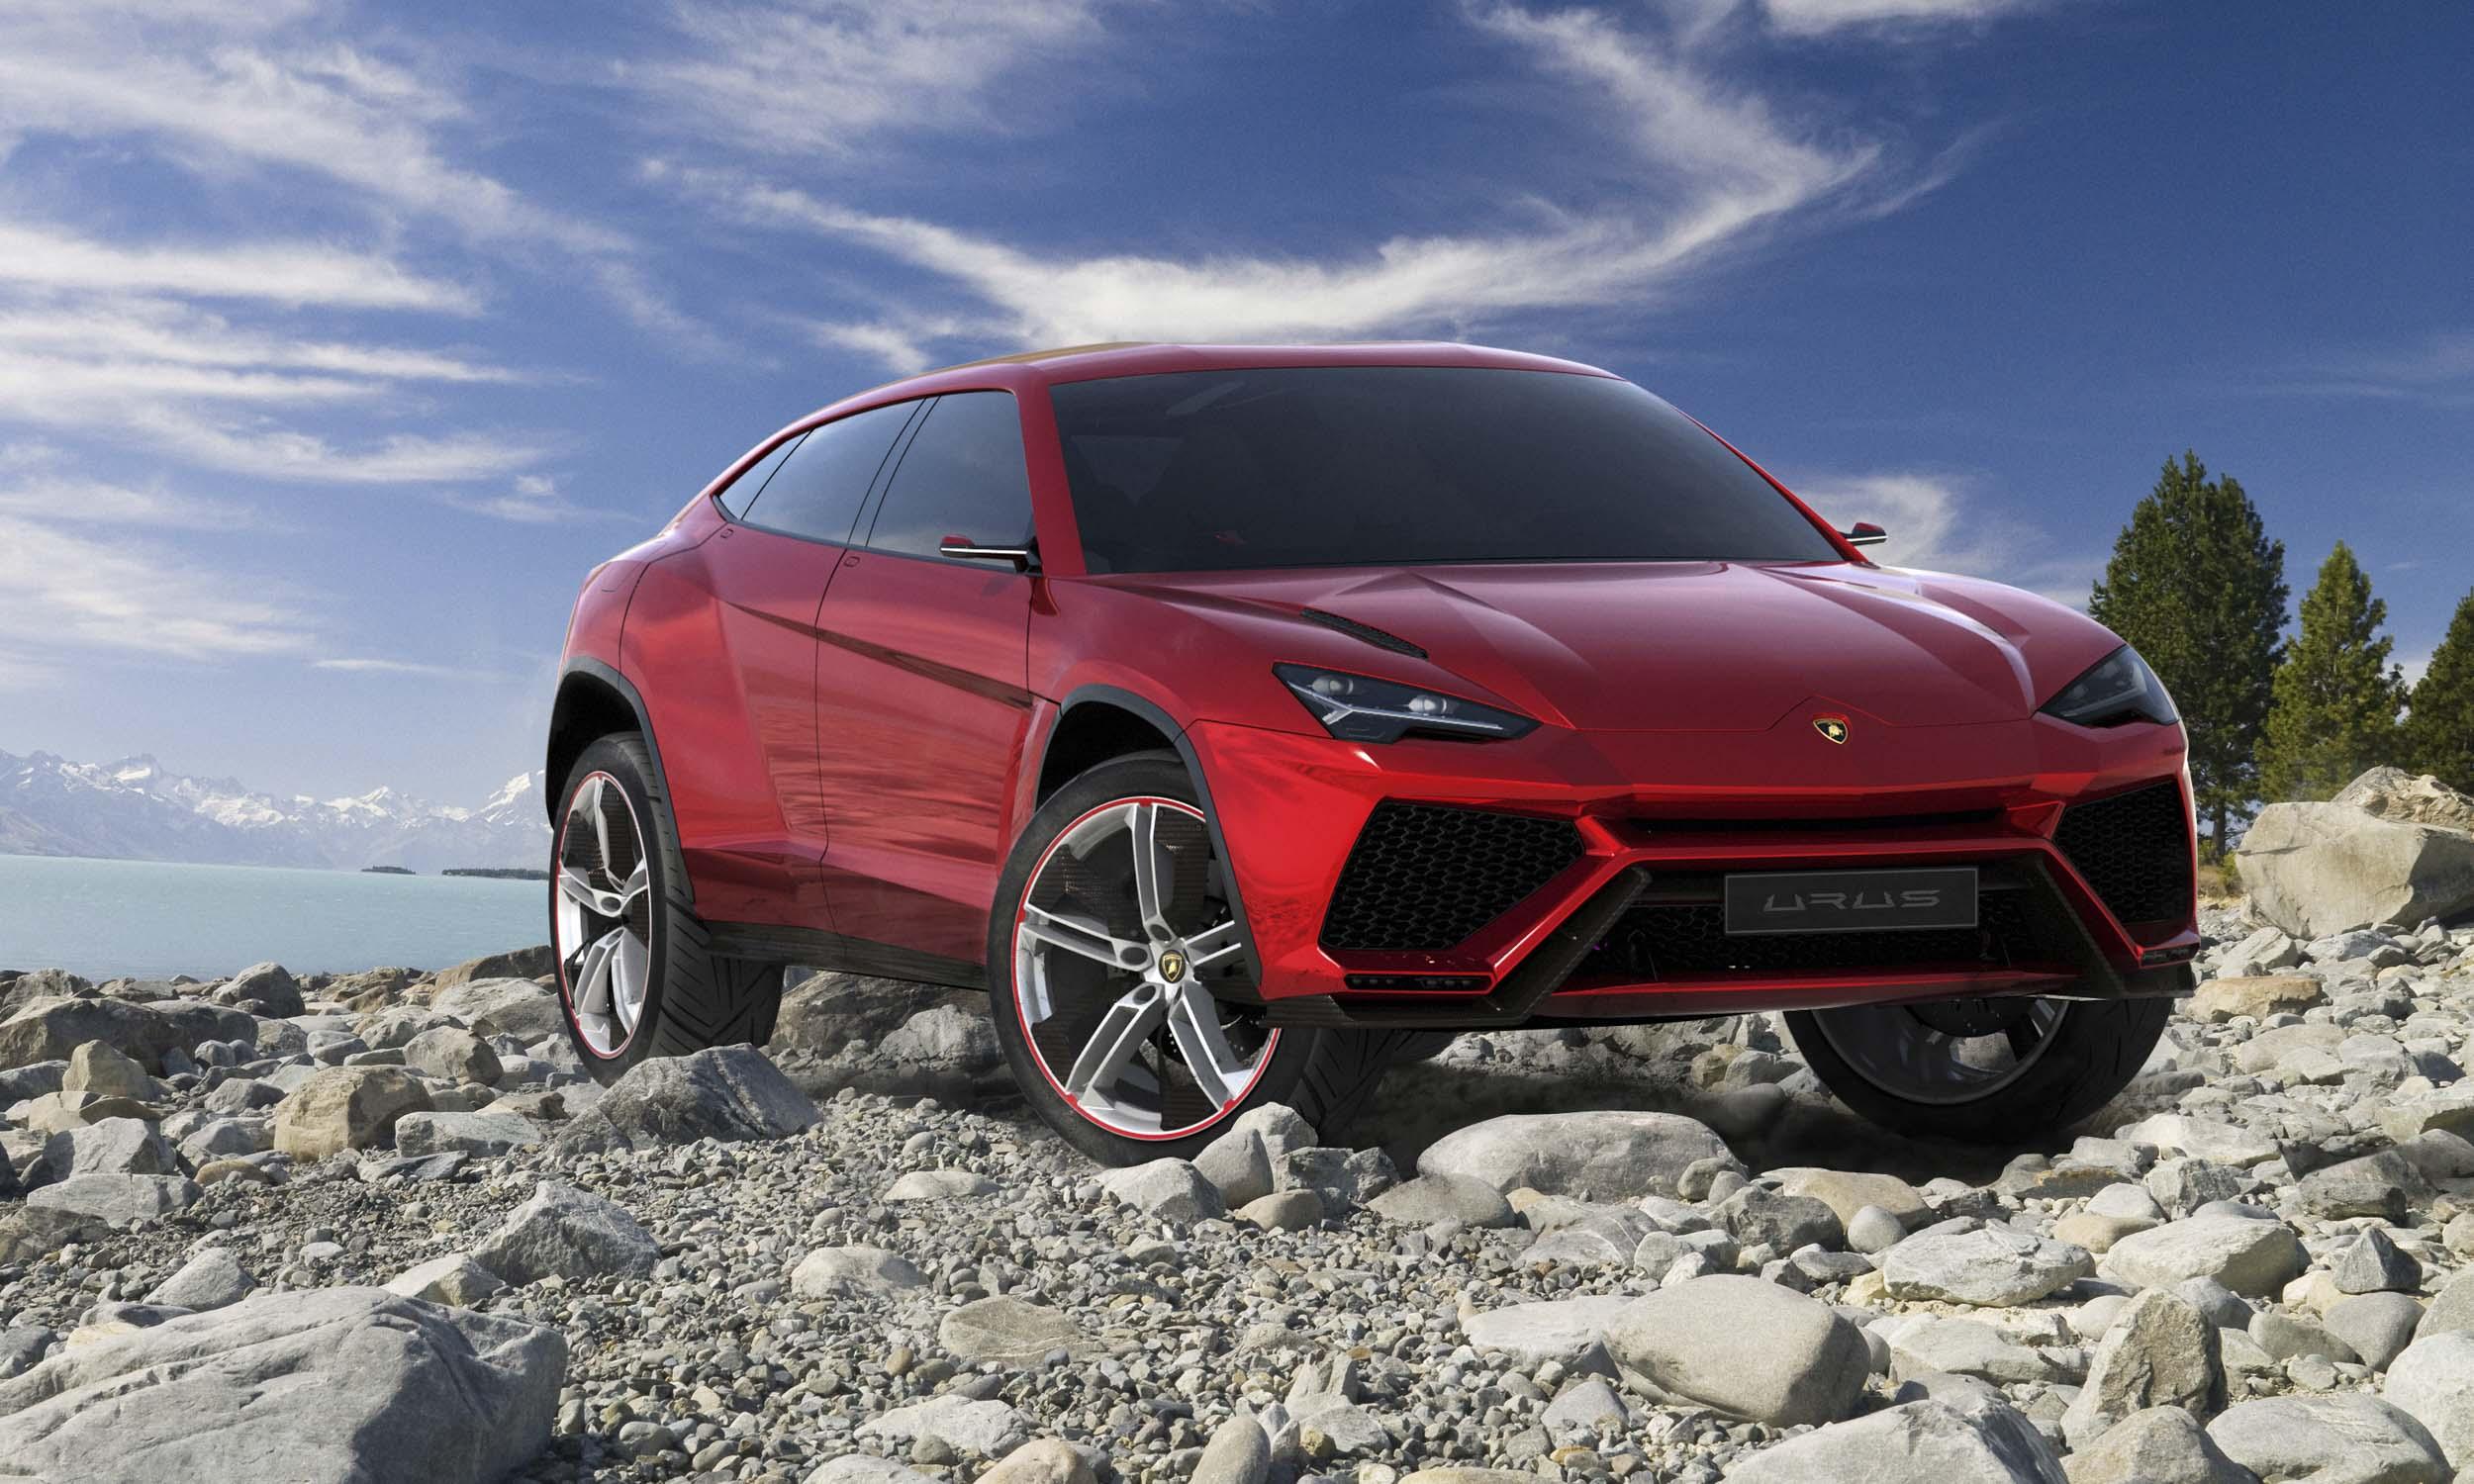 © Lamborghini